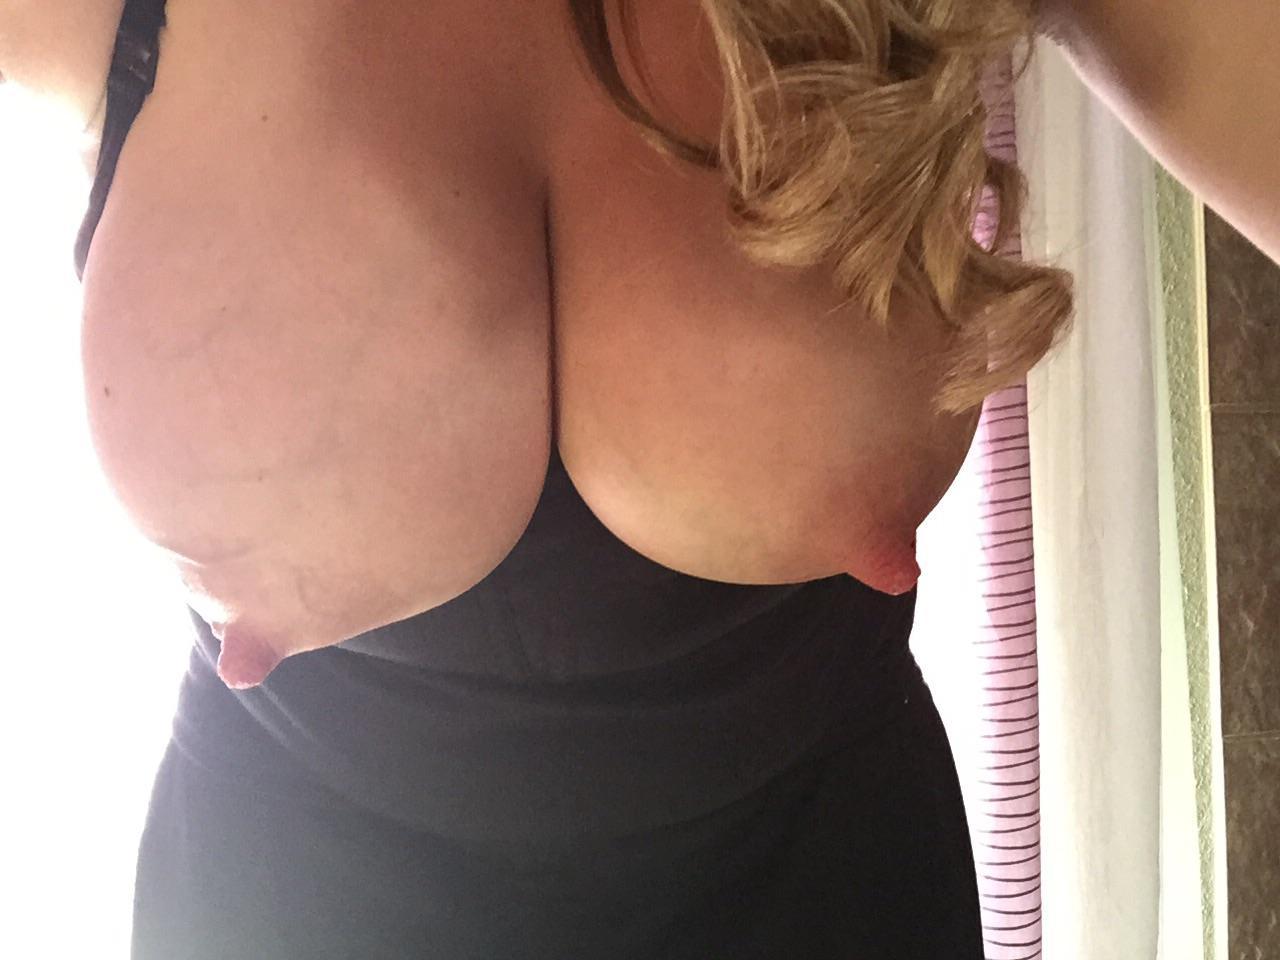 big tit hanging out shirt